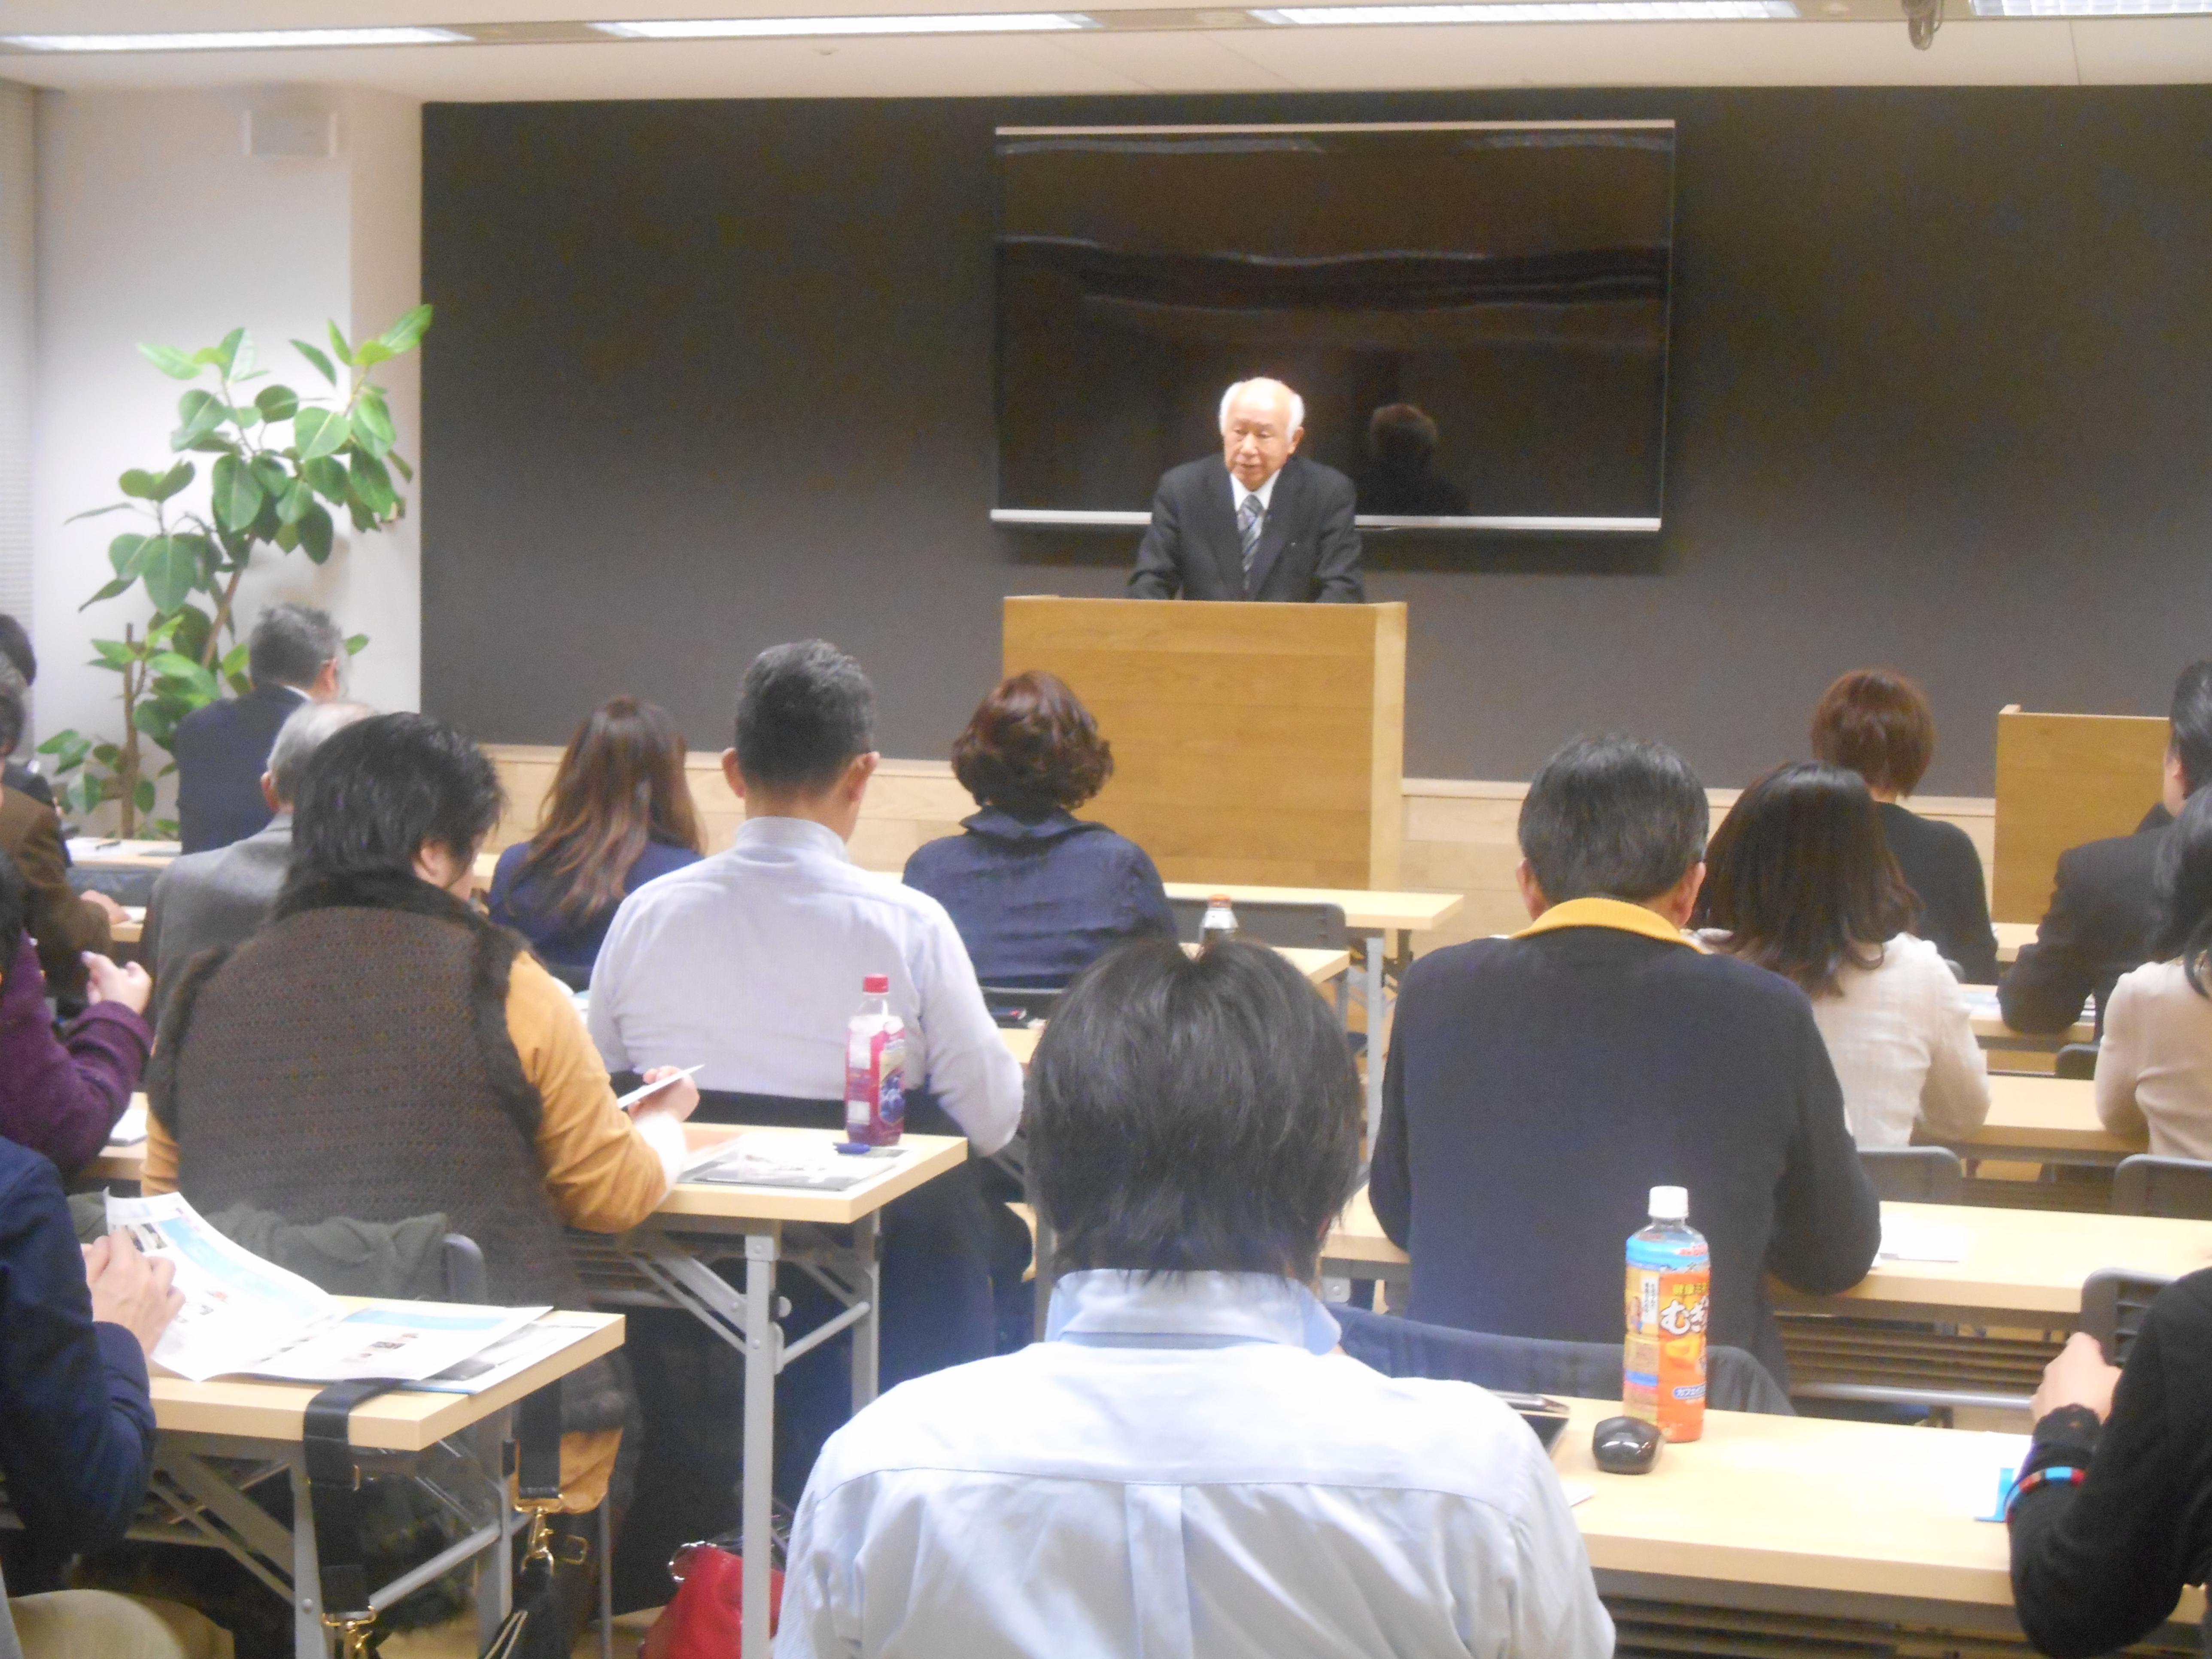 DSCN0449 - 平成30年度 東京思風塾 4月7日(土)「時代が問題をつくり、問題が人物をつくる」